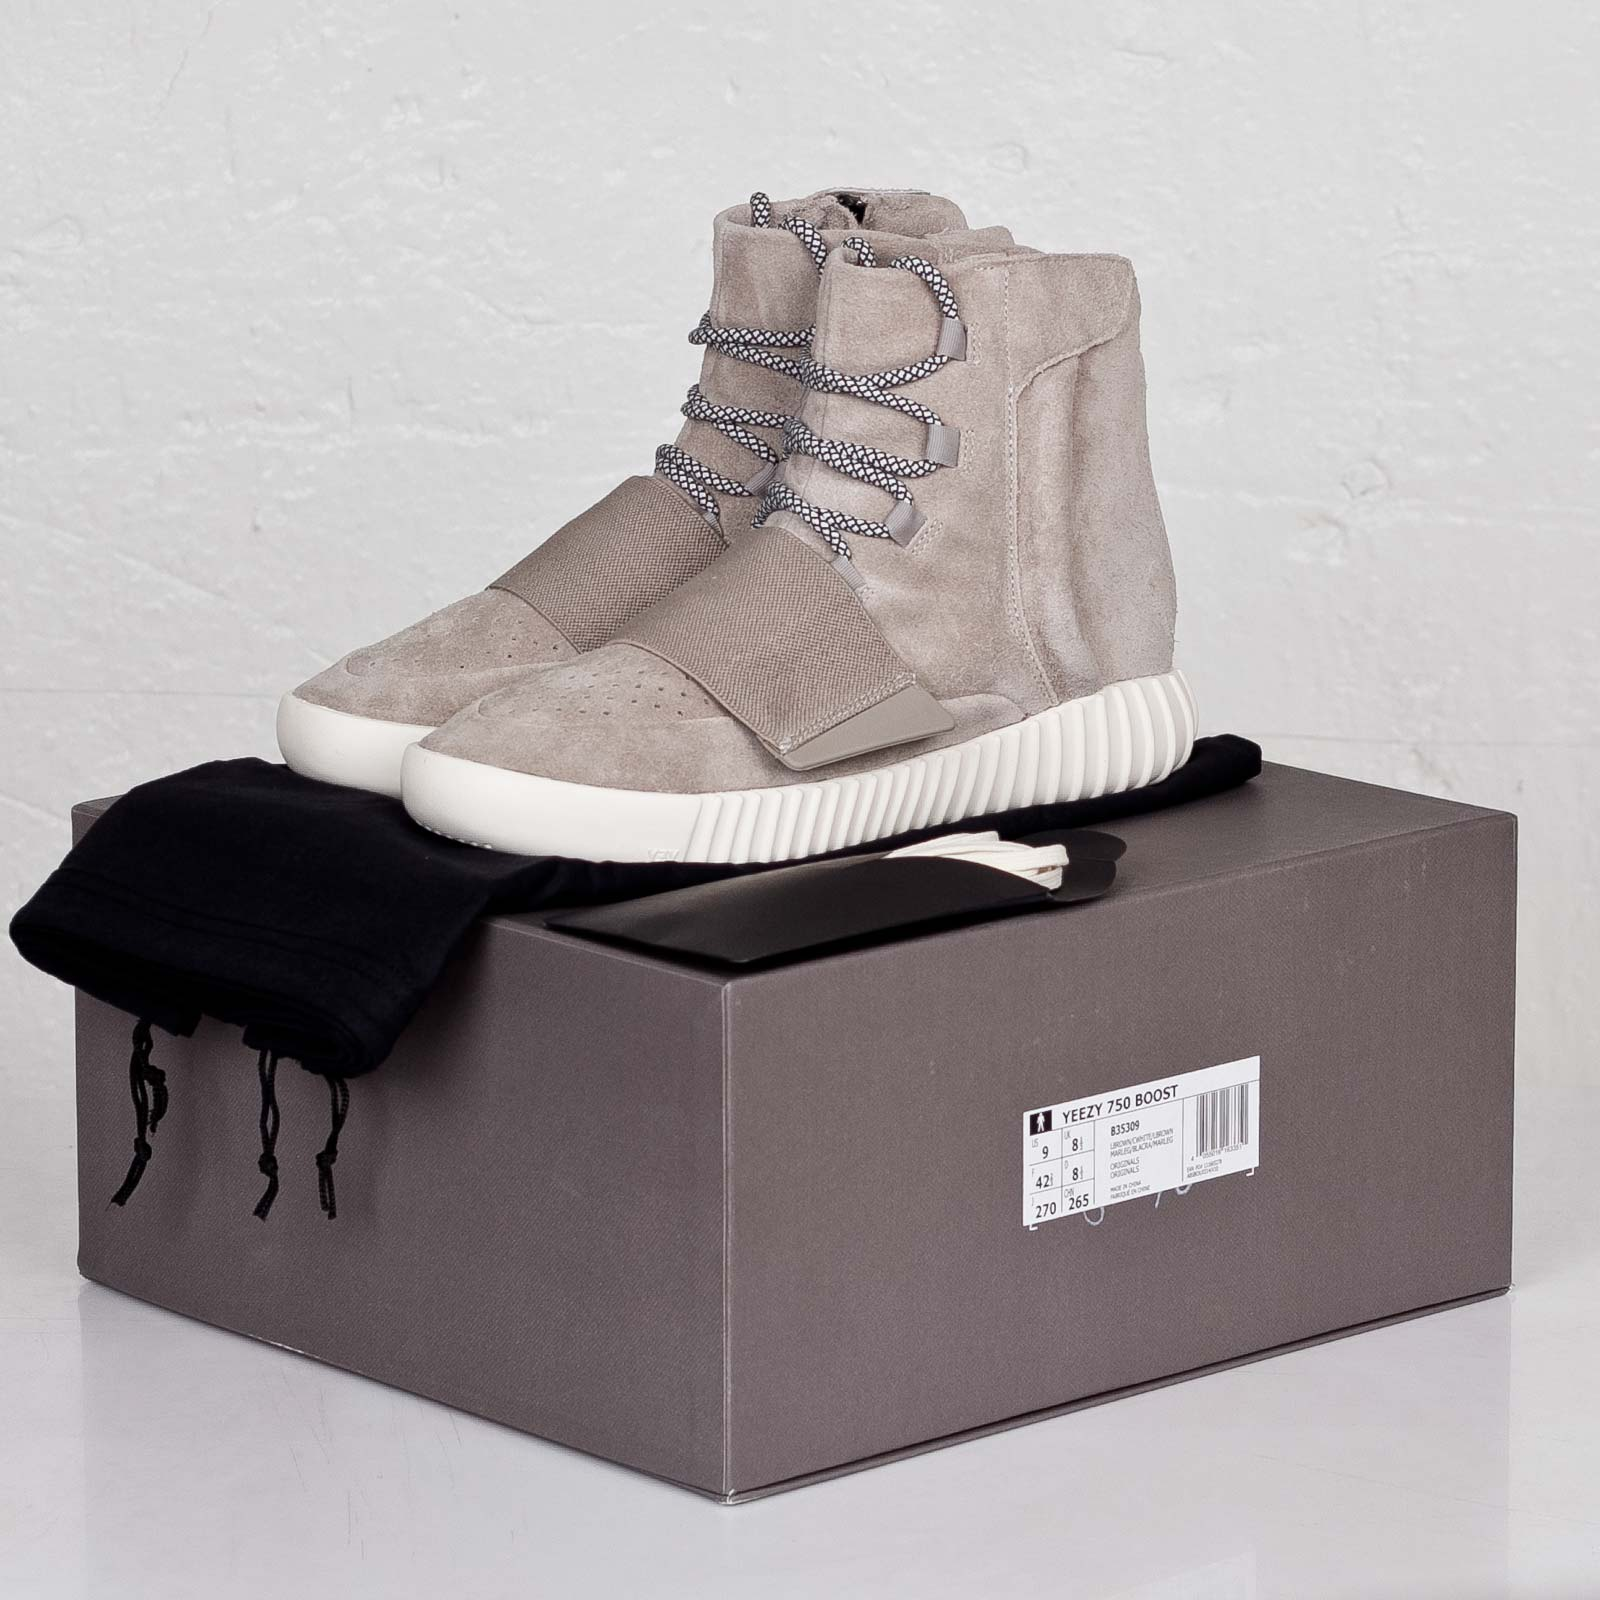 adidas Yeezy 750 Boost - B35309